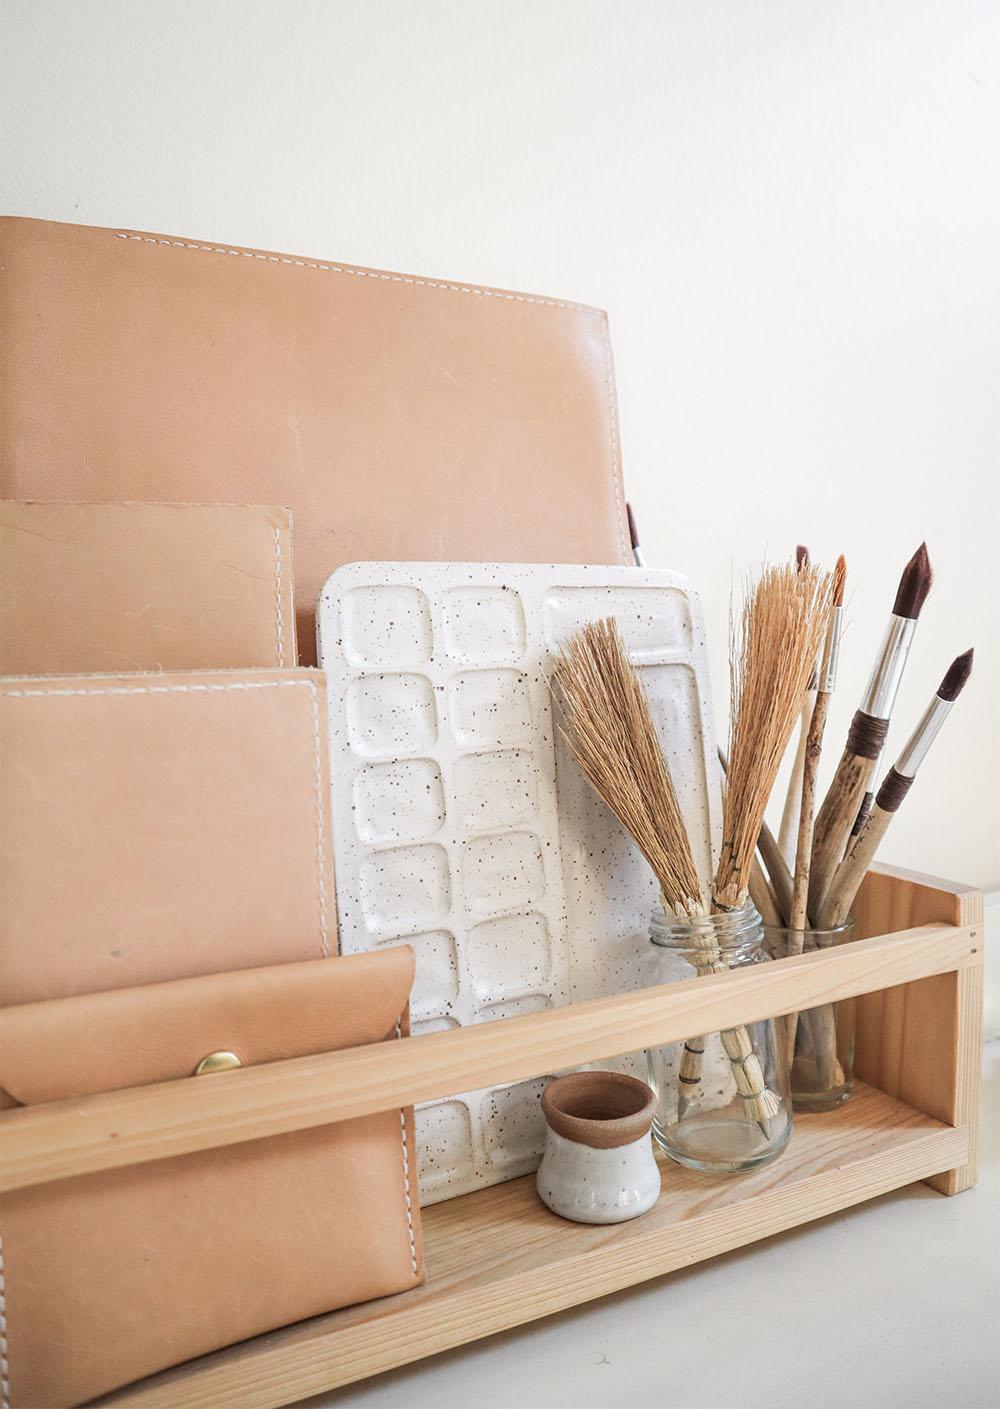 tinyhouse_homeoffice_handmade_supplies_smallspaces.jpg